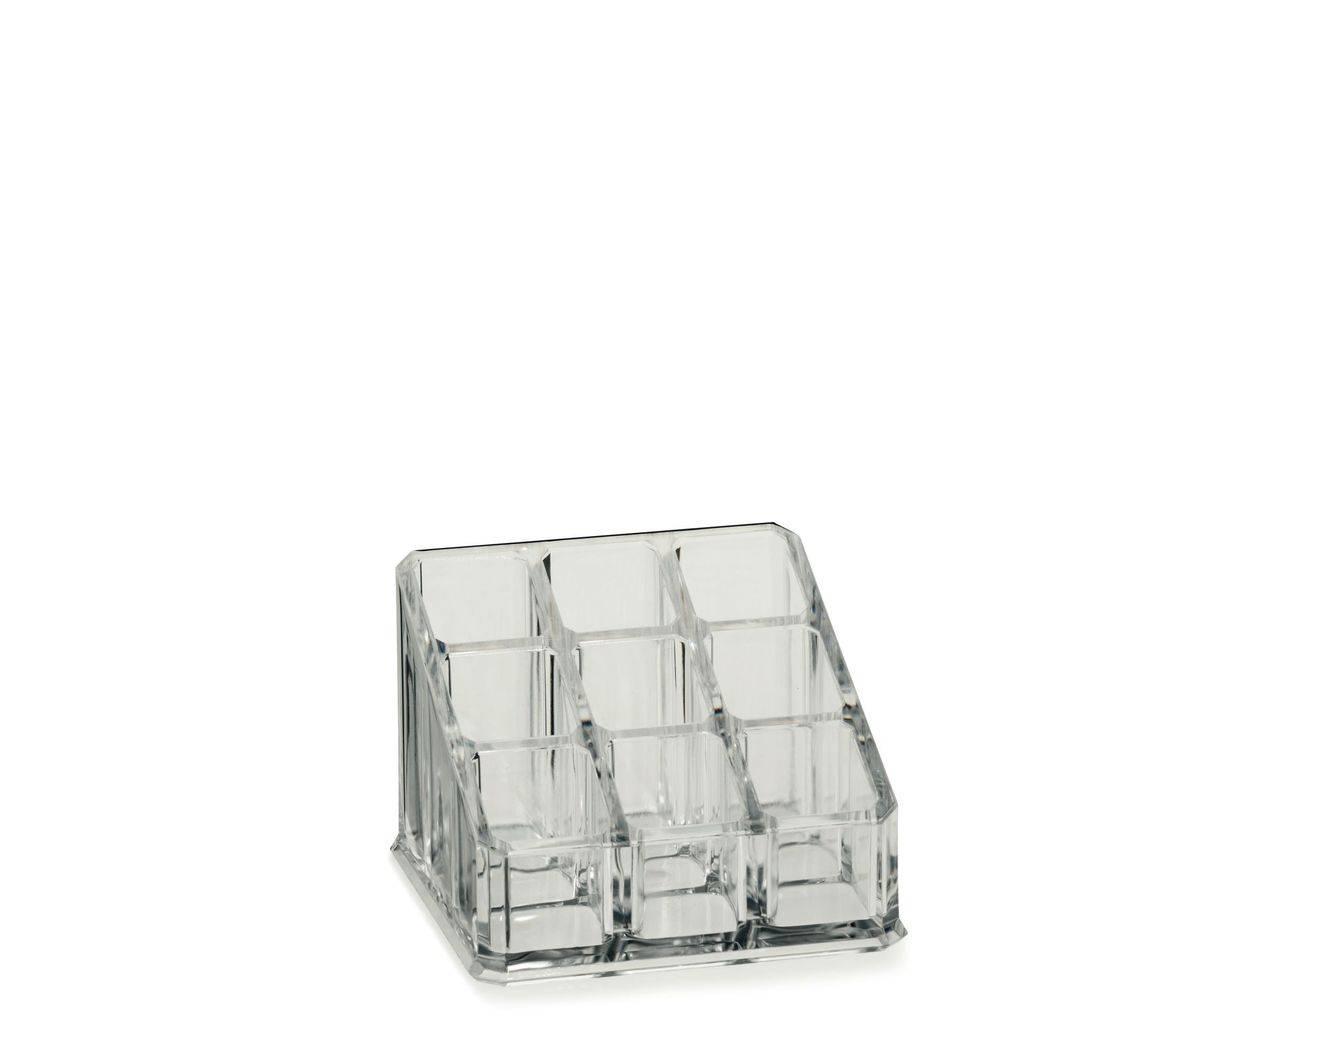 Kosmetická dóza SAFIRA, plast, transparent, 9x9x6,5cm - Kela